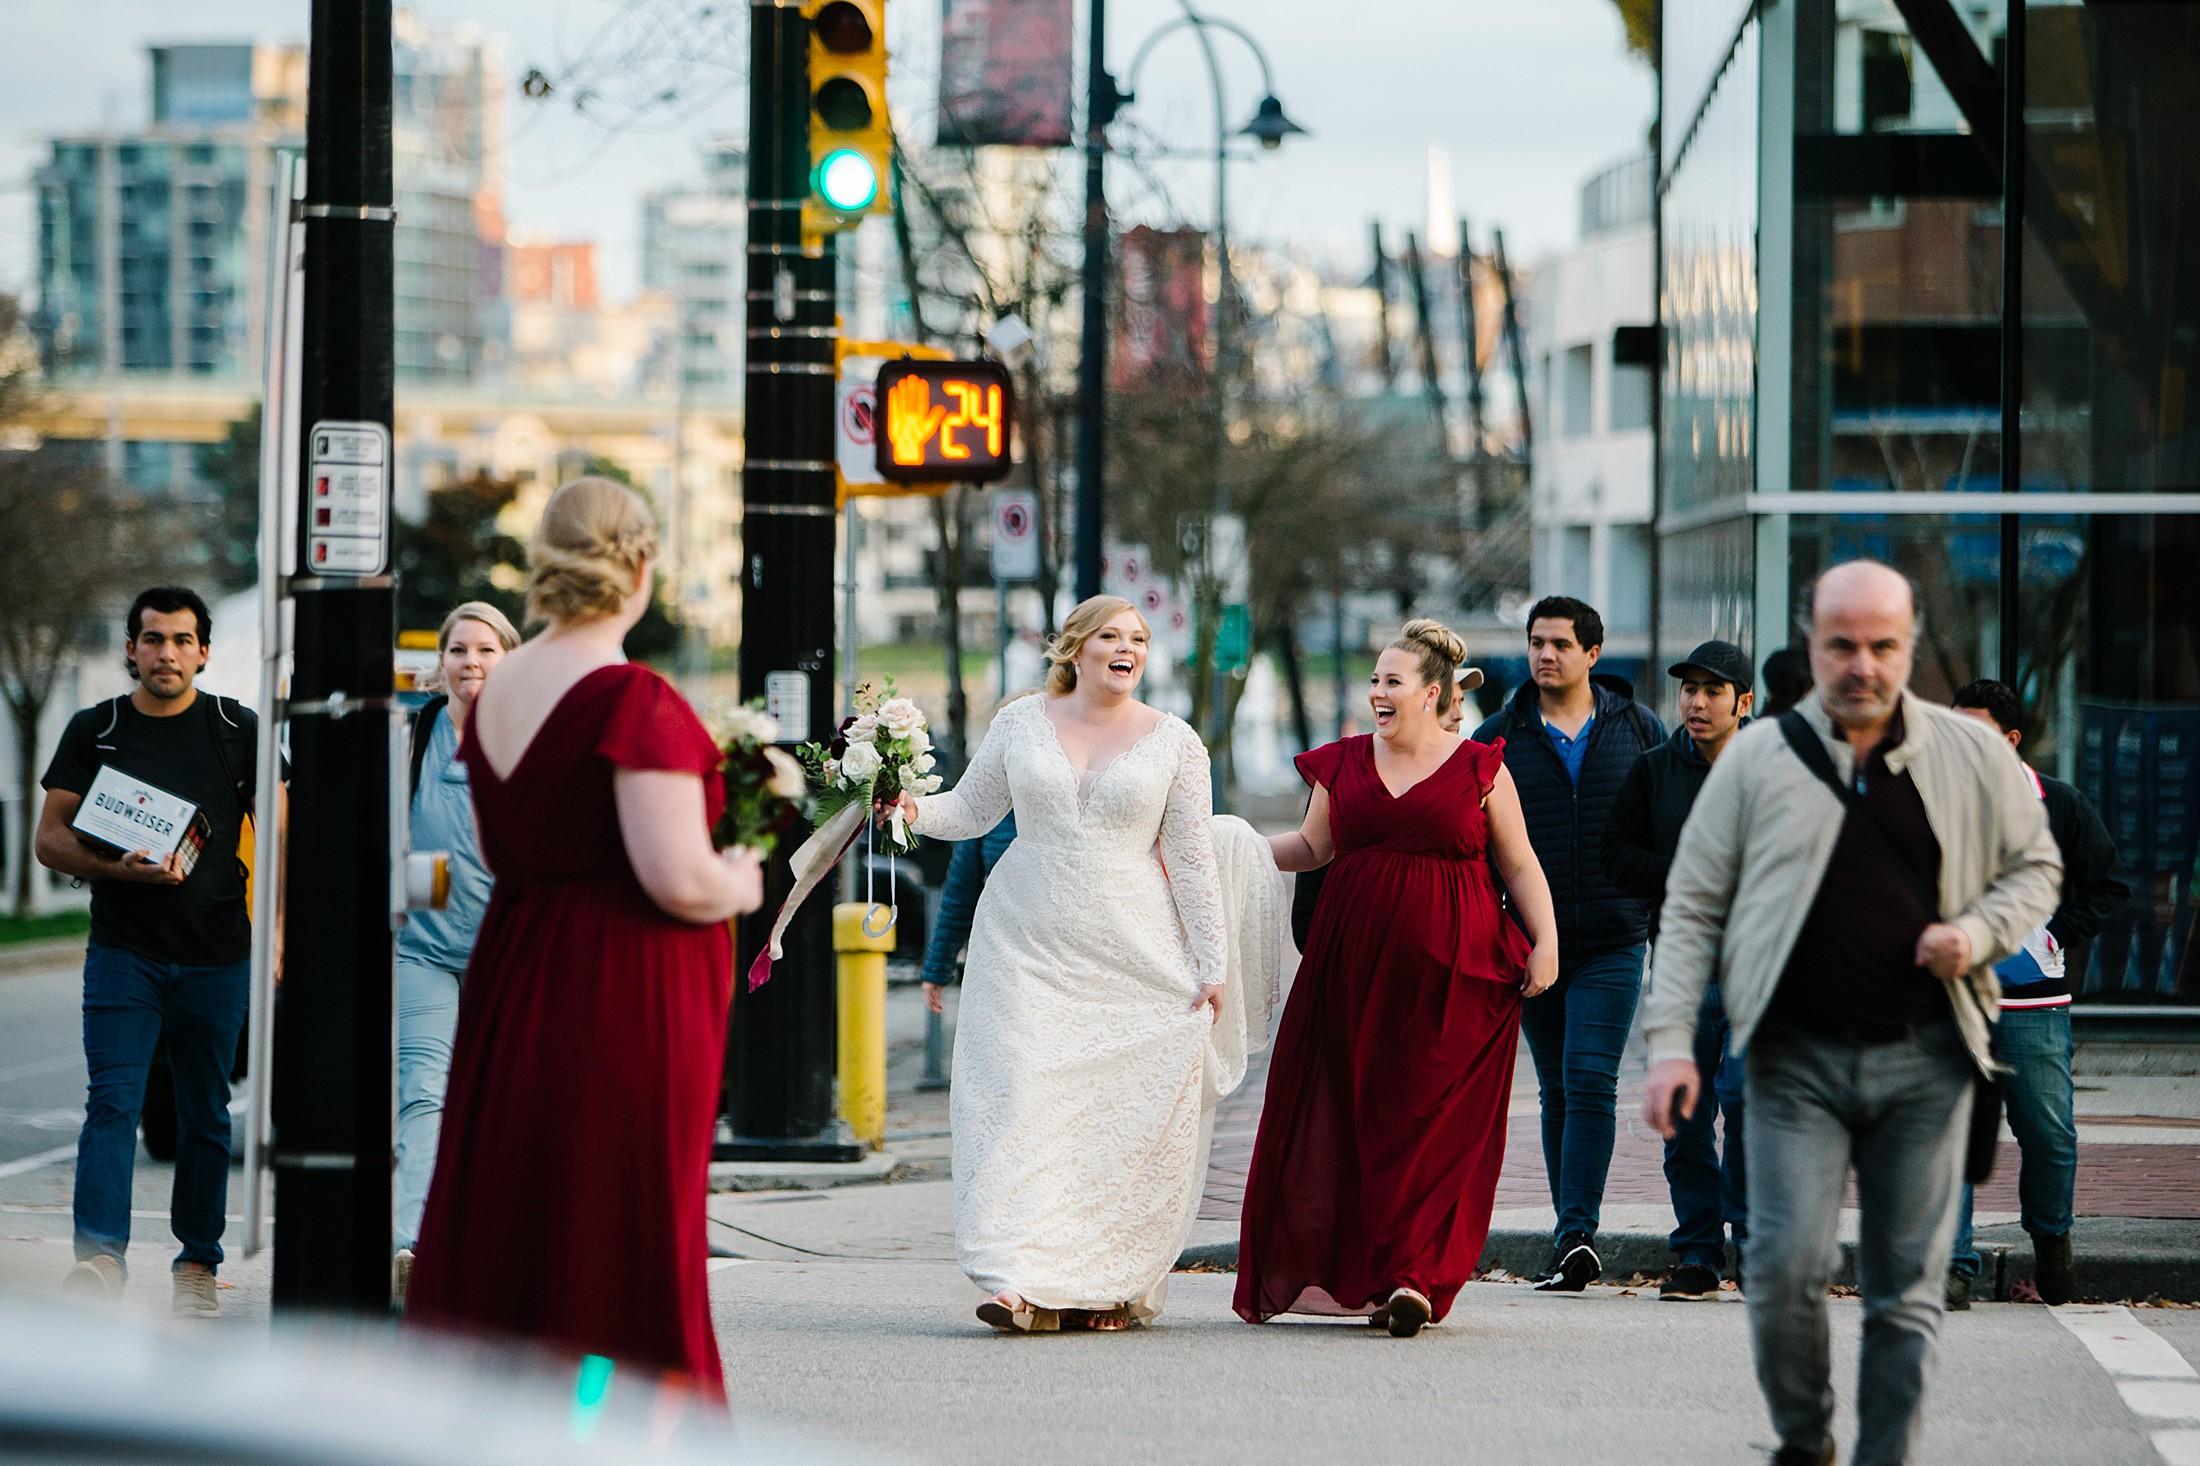 October26.StephAndrew472_Note Photography Documentary Photographer Wedding Photos Vancouver B.C. Best of 2018 2019 2020 Vancouver Island Okanagan Banff Edmonton Victoria.jpg